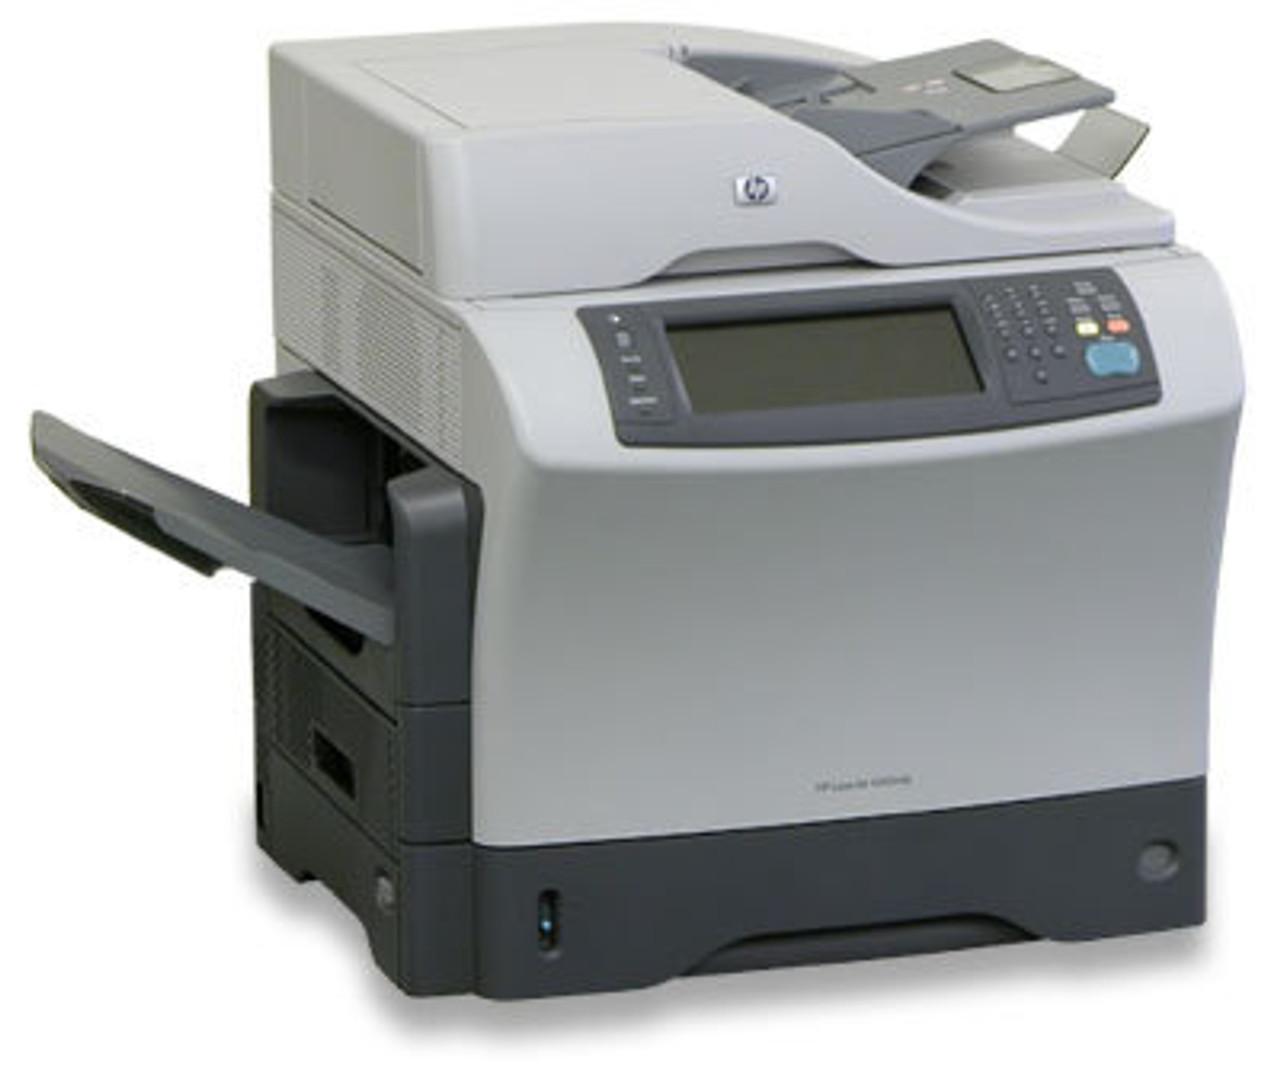 HP LaserJet M4345 MFP - CB425A - HP Laser Printer for sale